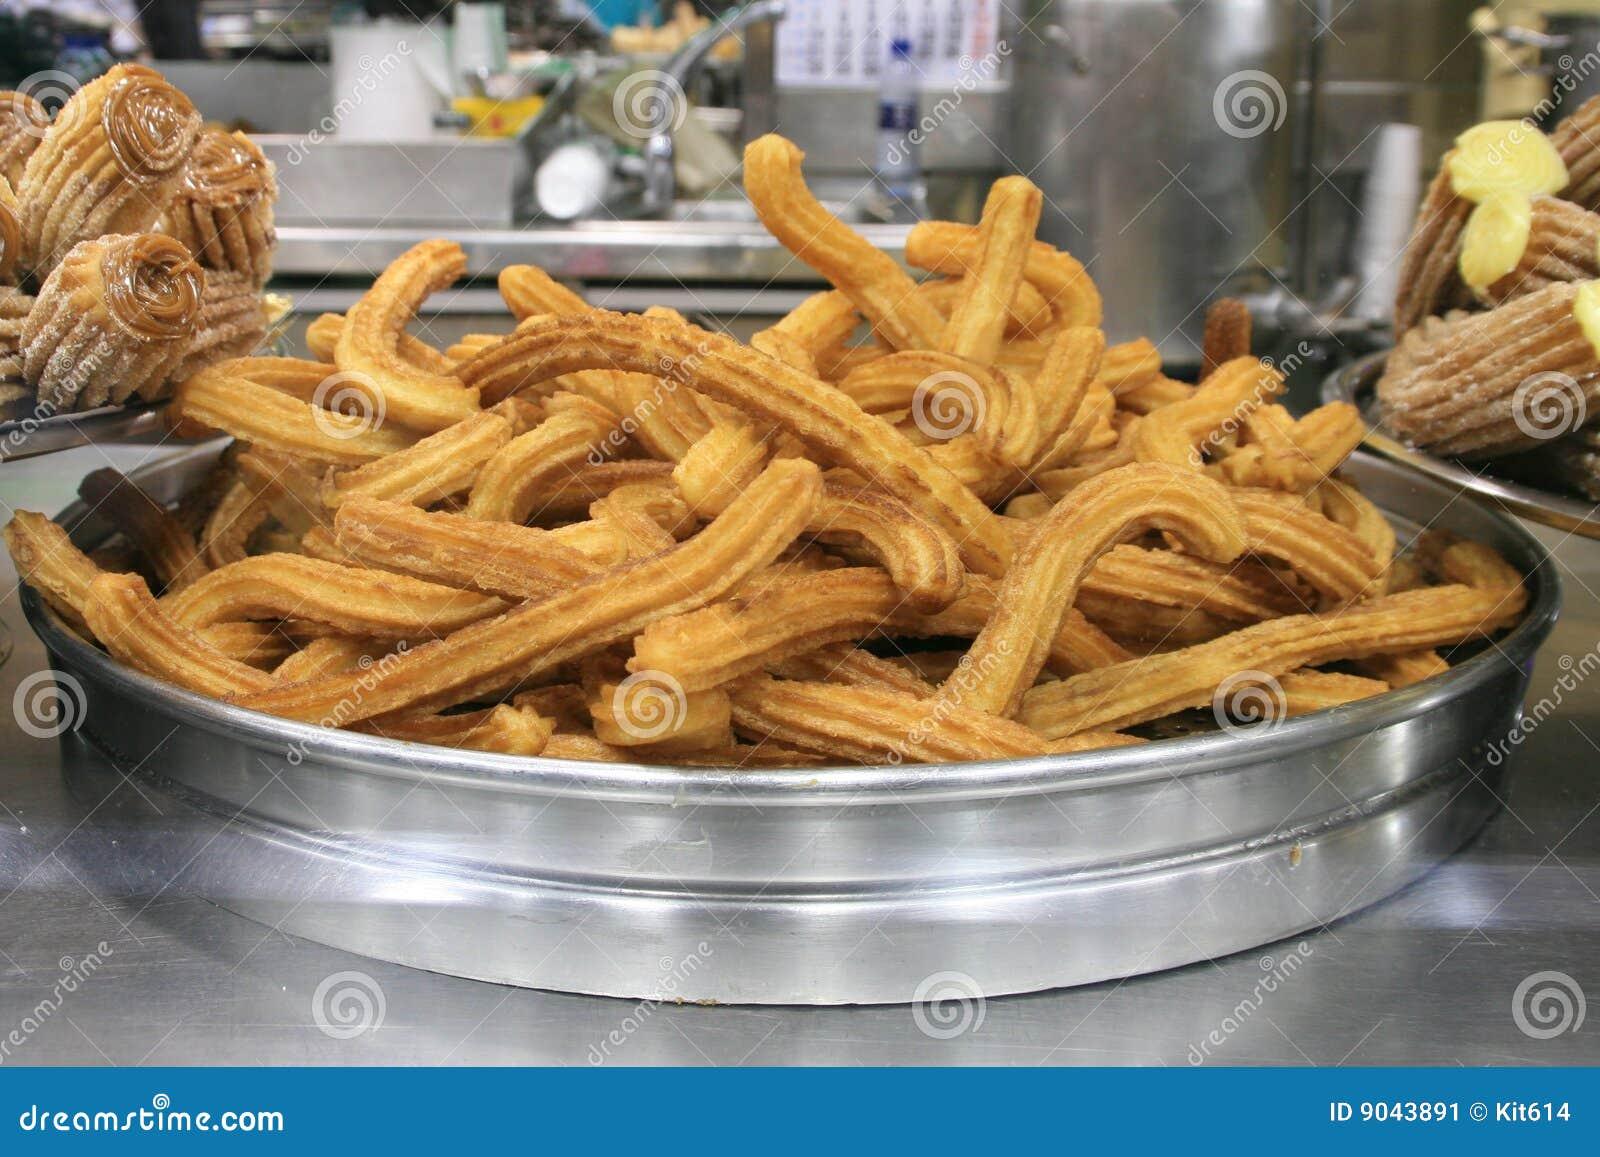 Famous Spanish Dessert - Churros Stock Image - Image: 9043891